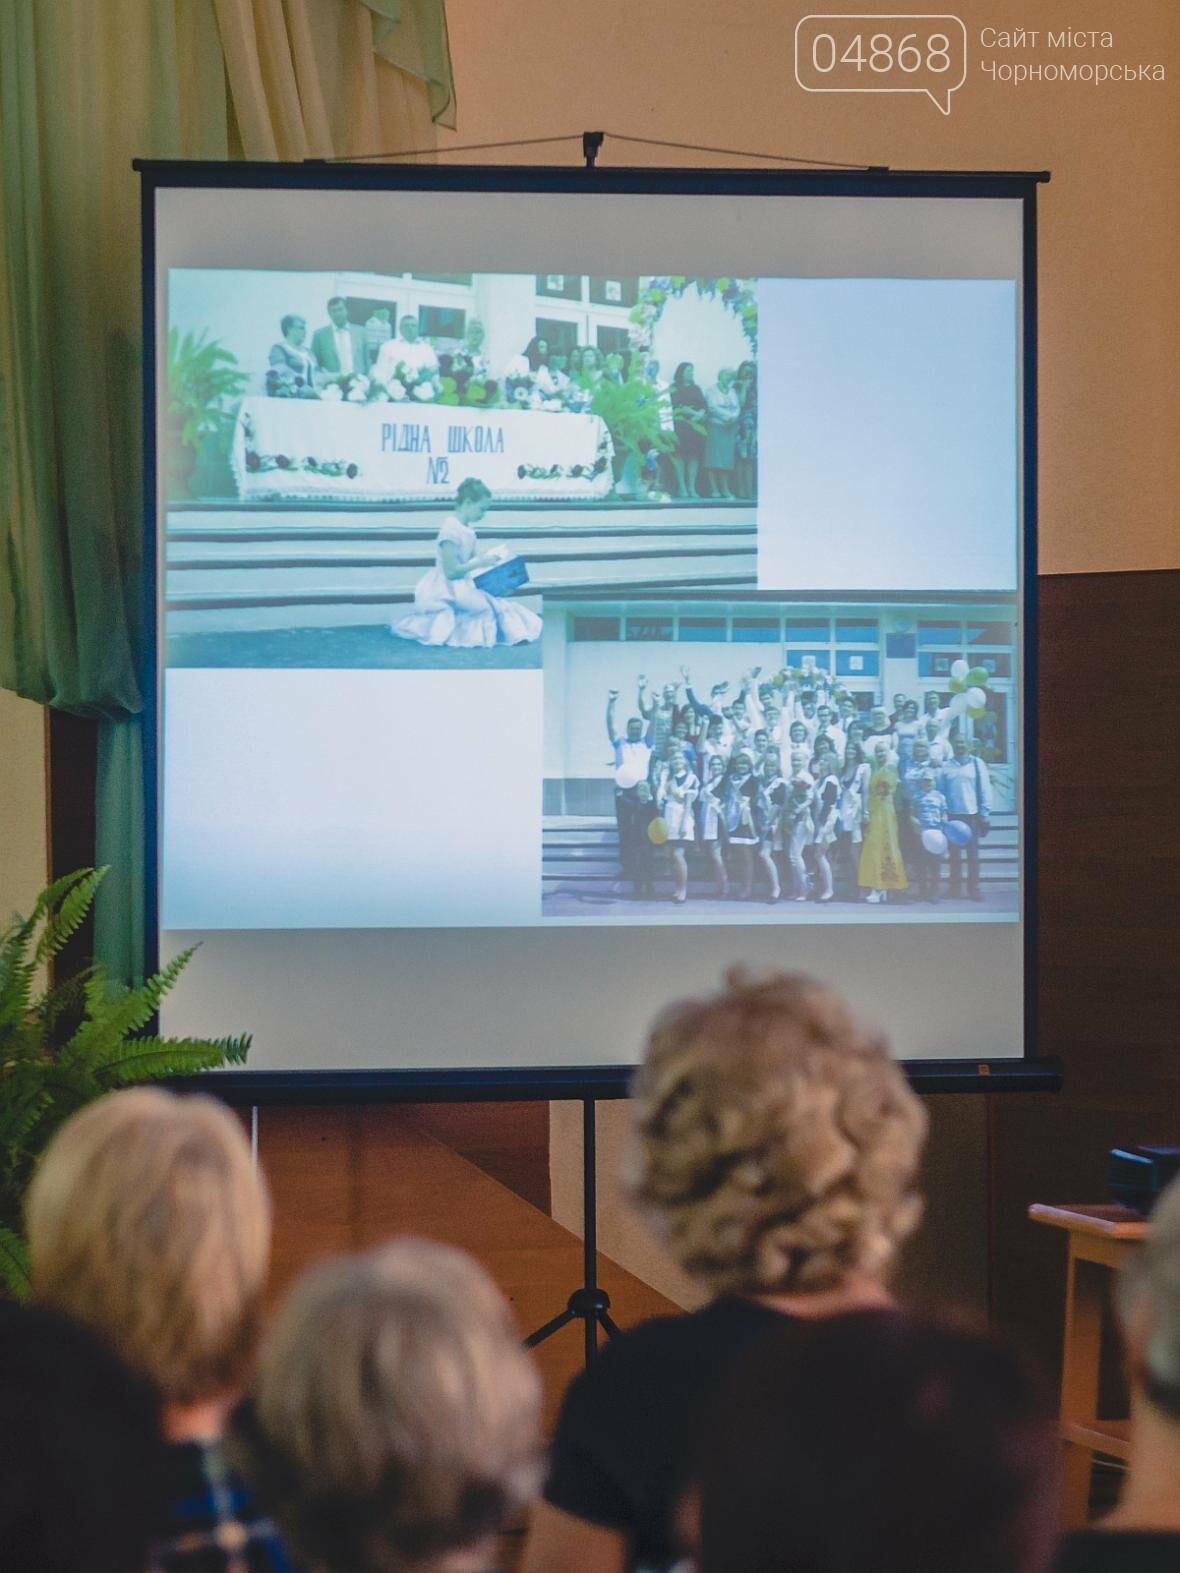 Черноморская школа № 2 отметила 50-летие (фото), фото-10